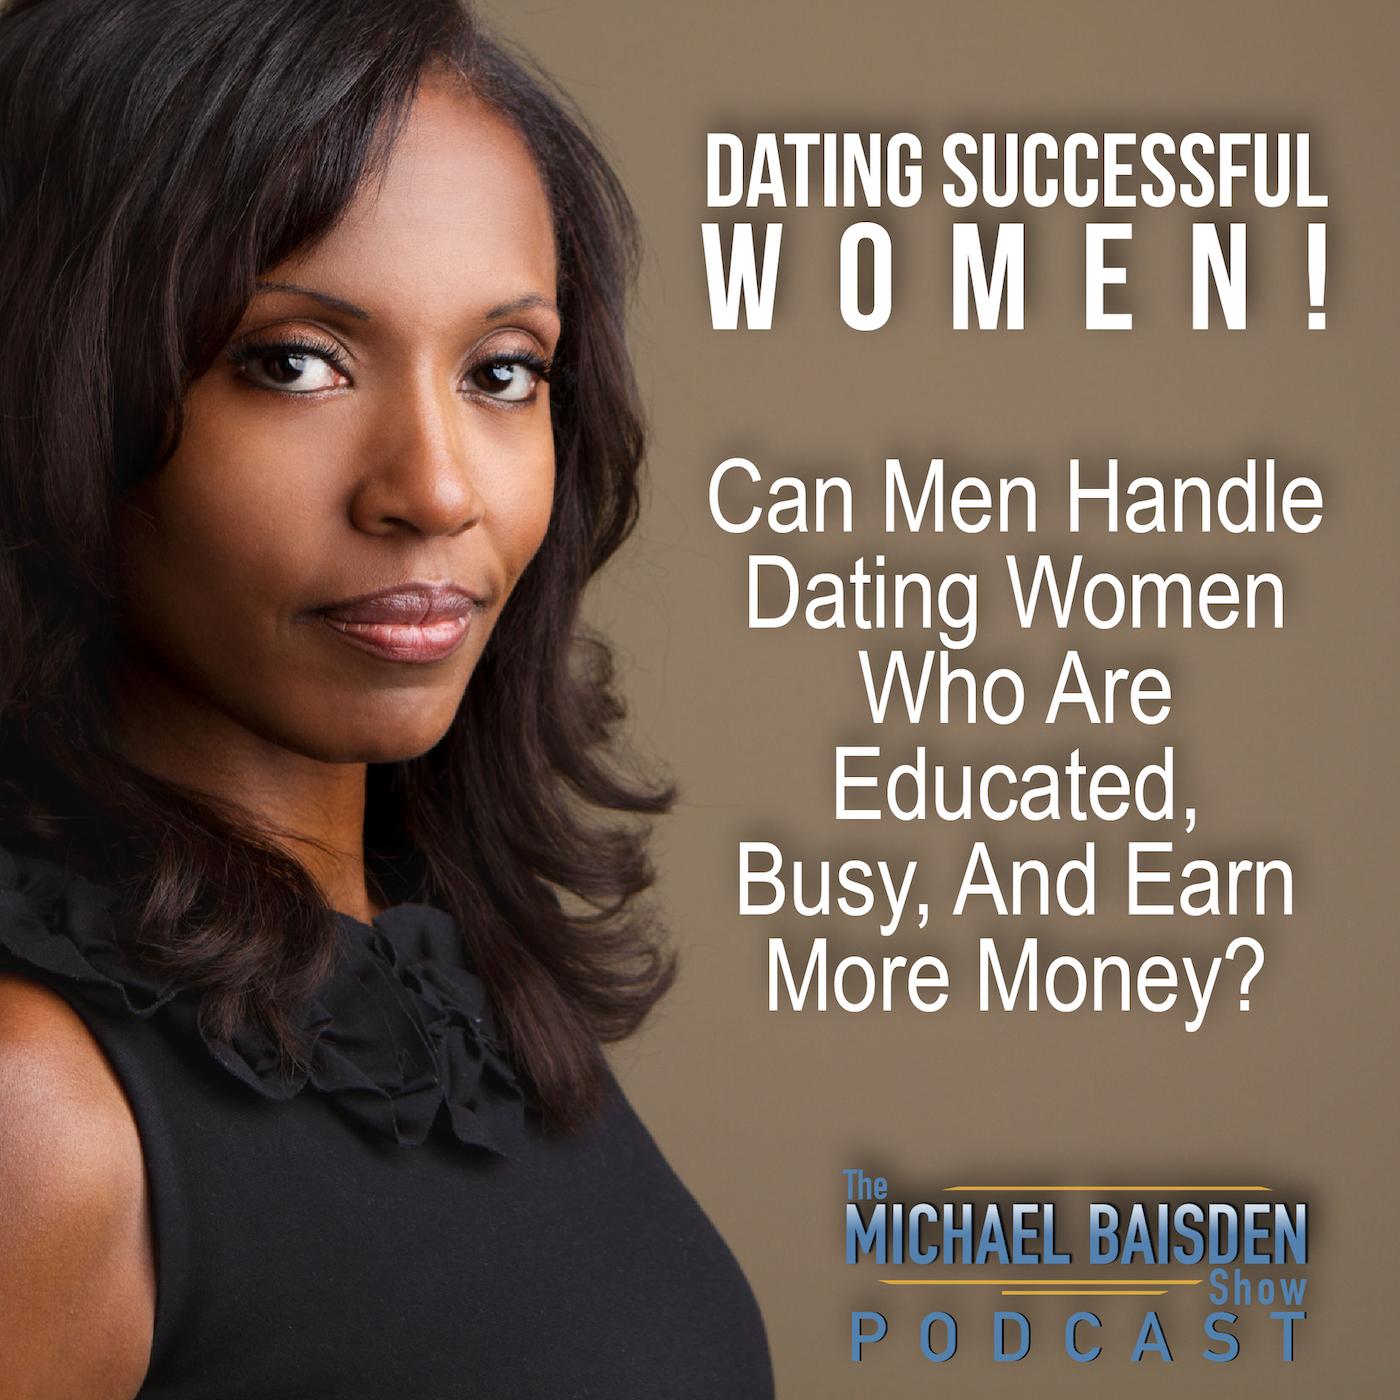 Successful women dating